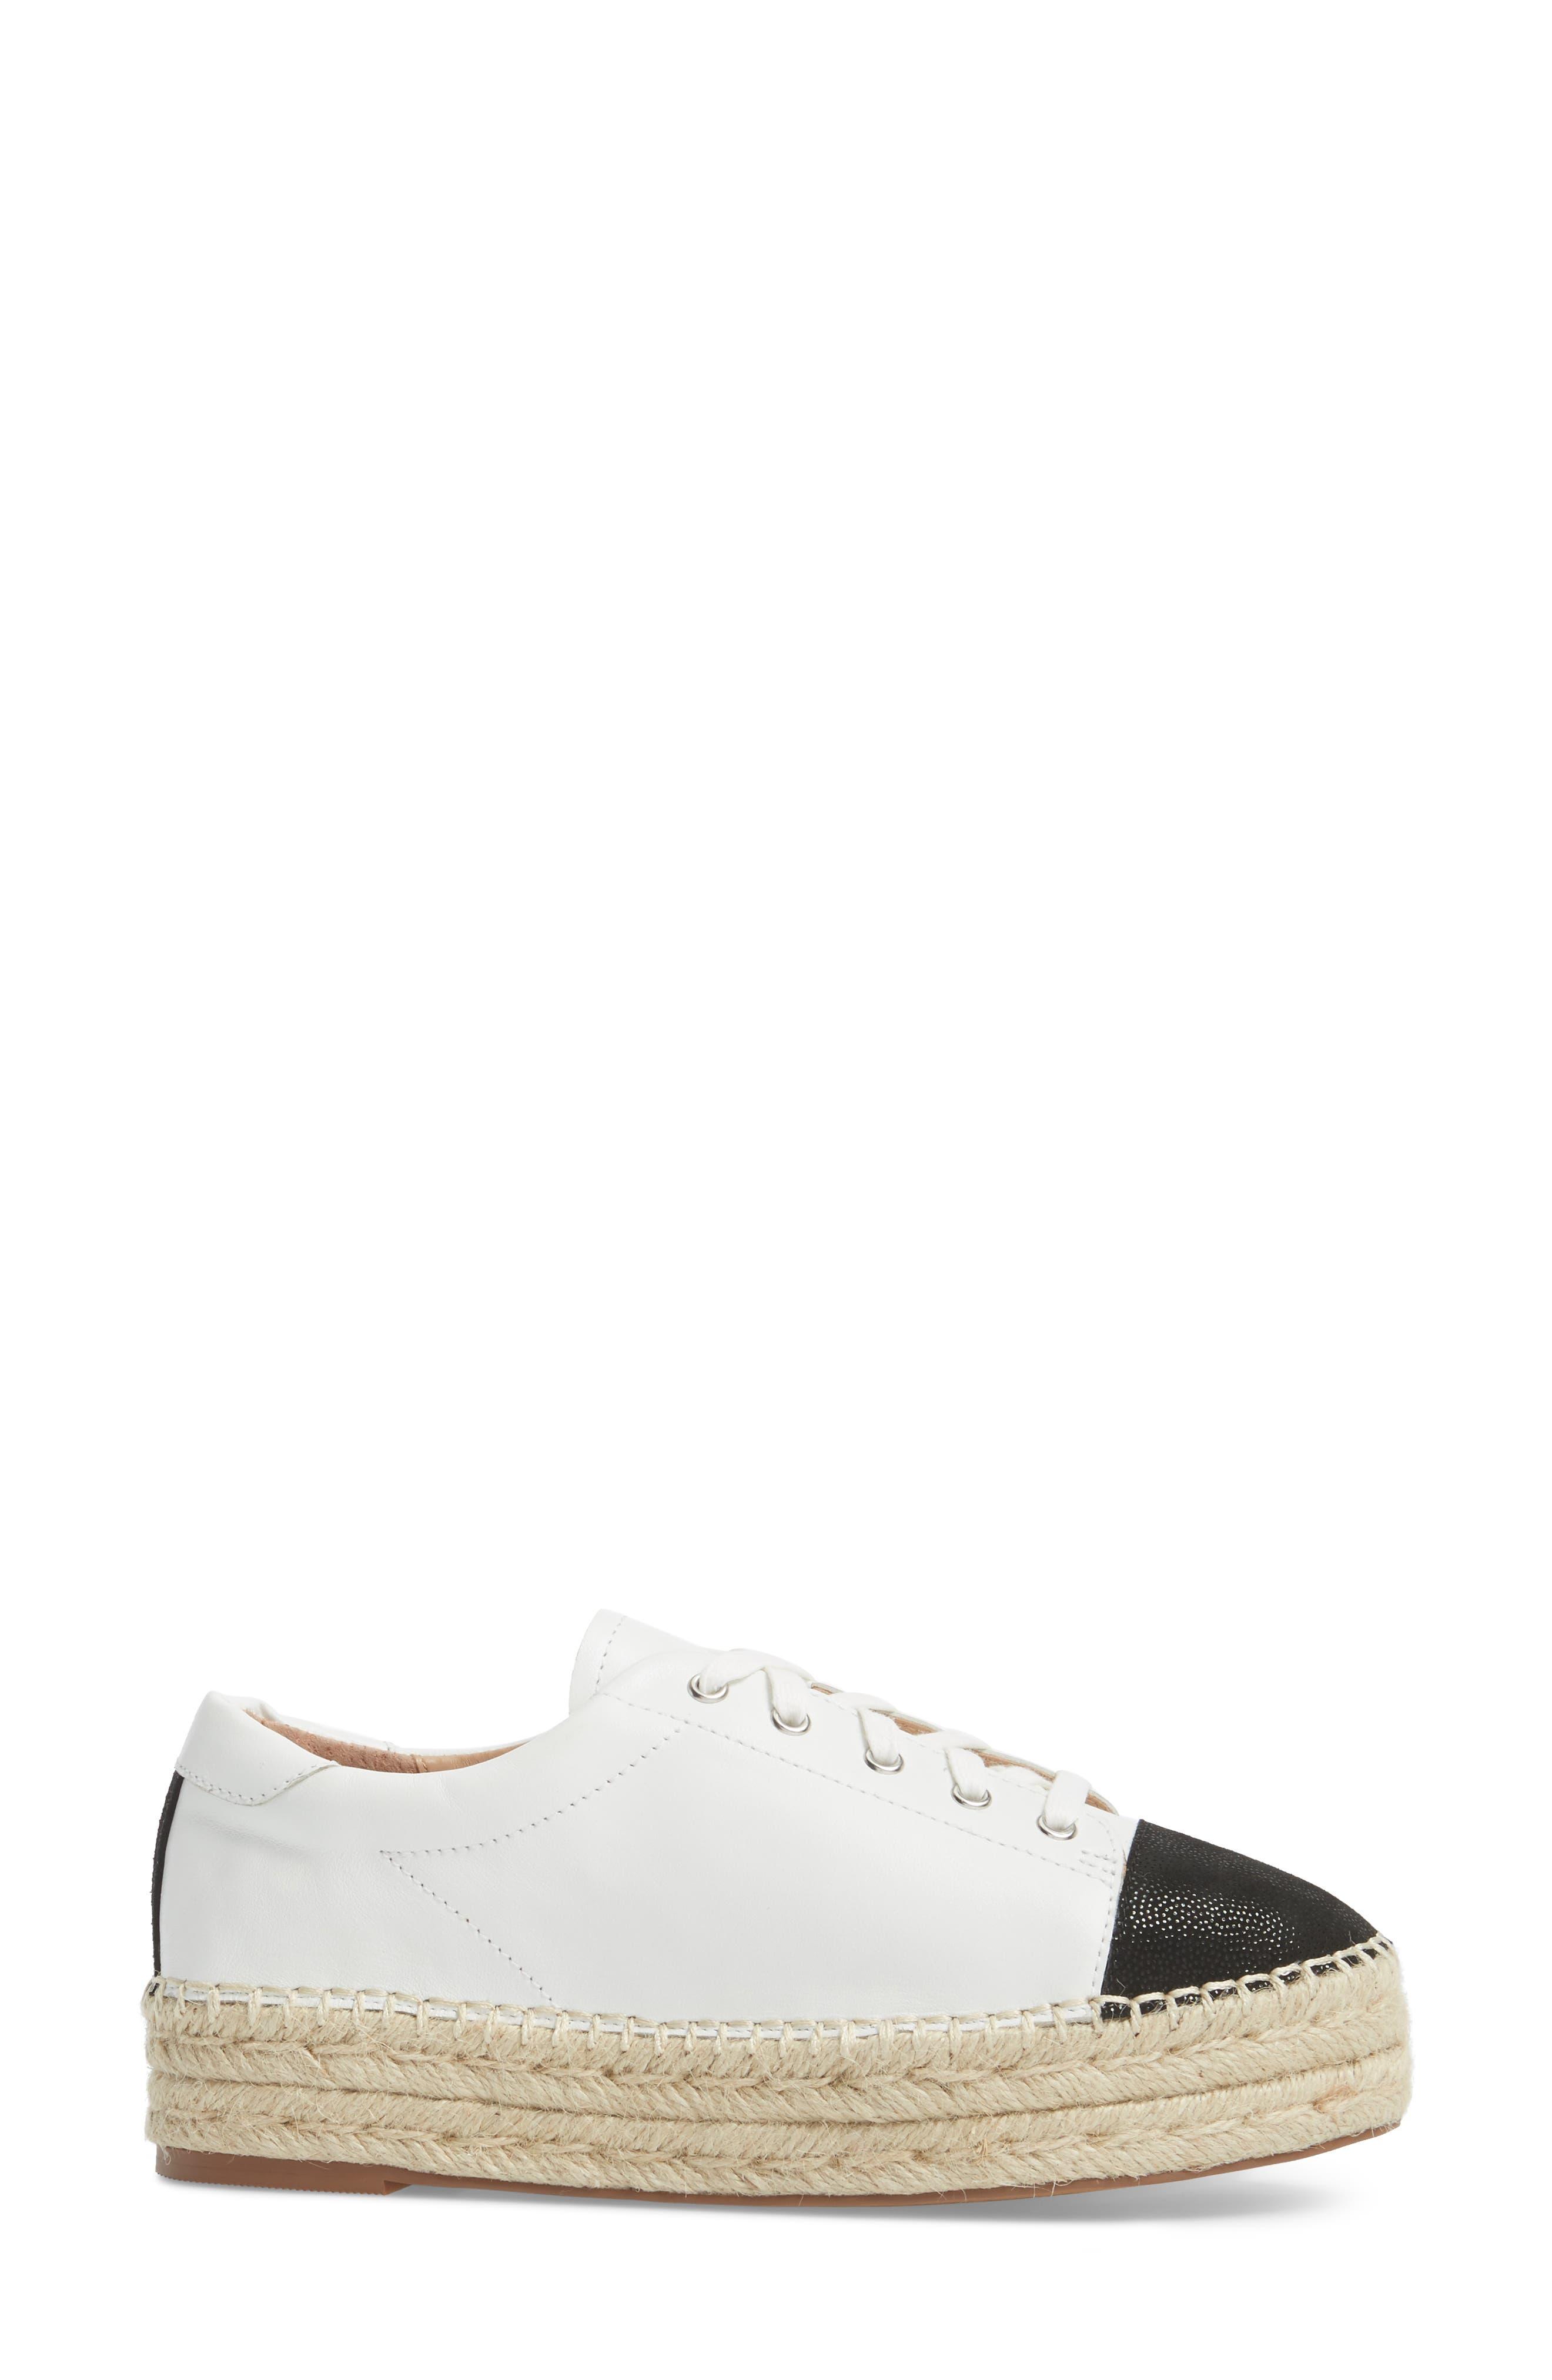 Sierra Espadrille Platform Sneaker,                             Alternate thumbnail 3, color,                             108